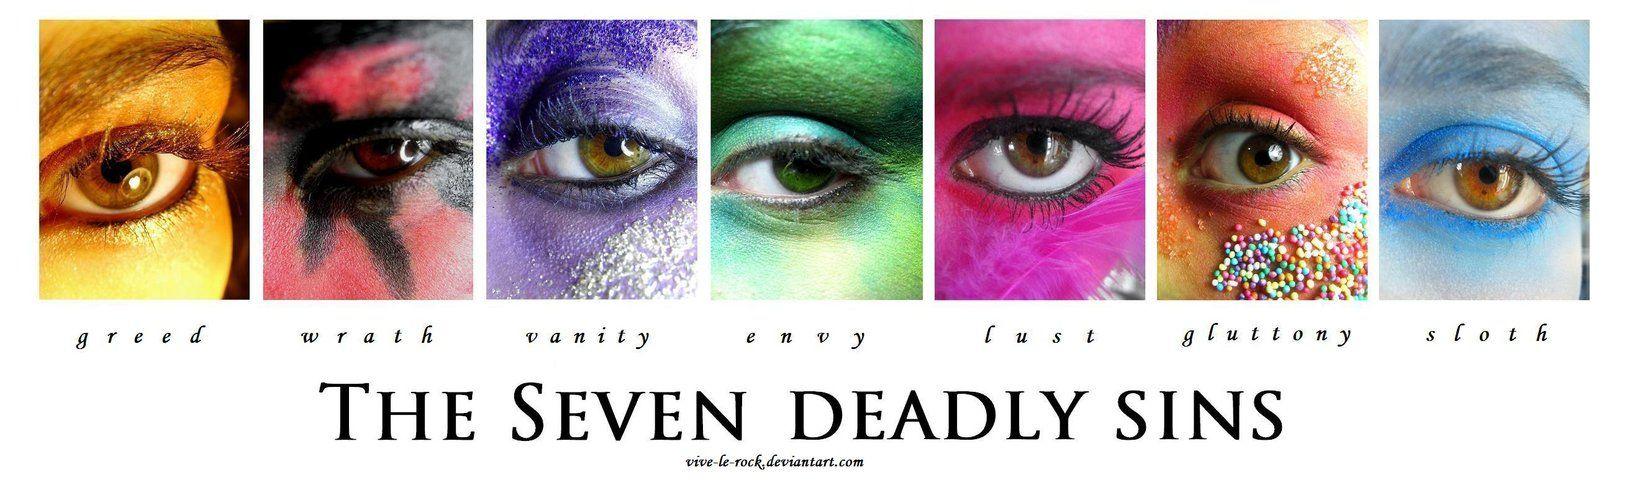 7 deadly sins - photography ideas?